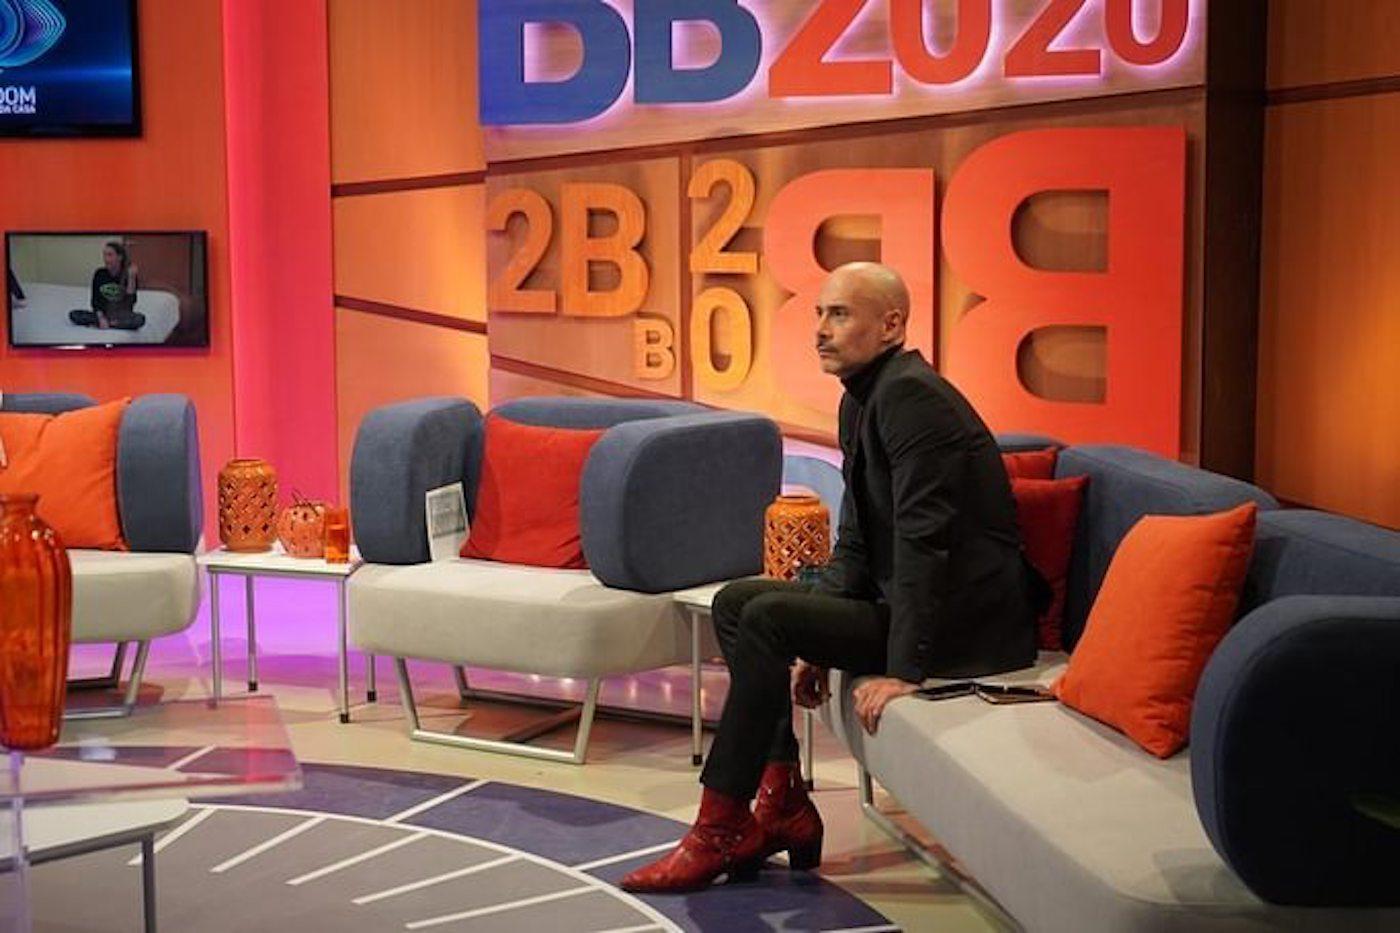 Pedro Crispim Big Brother Pedro Crispim Critica Concorrentes Do Big Brother 2020